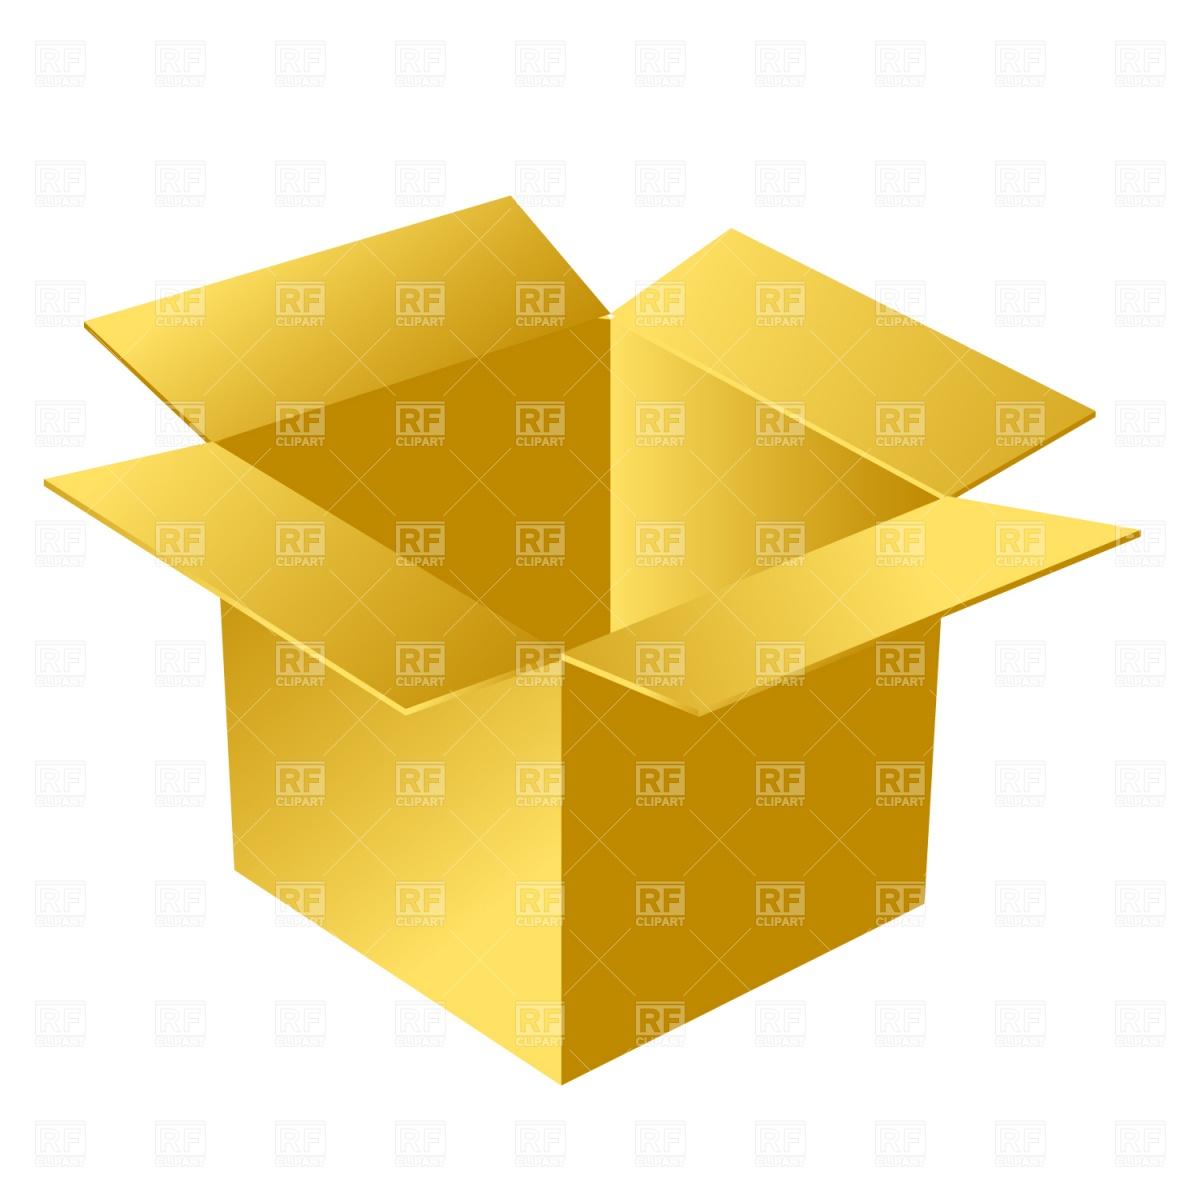 Open Cardboard Box Download Royalty Free-Open Cardboard Box Download Royalty Free Vector Clipart Eps-16